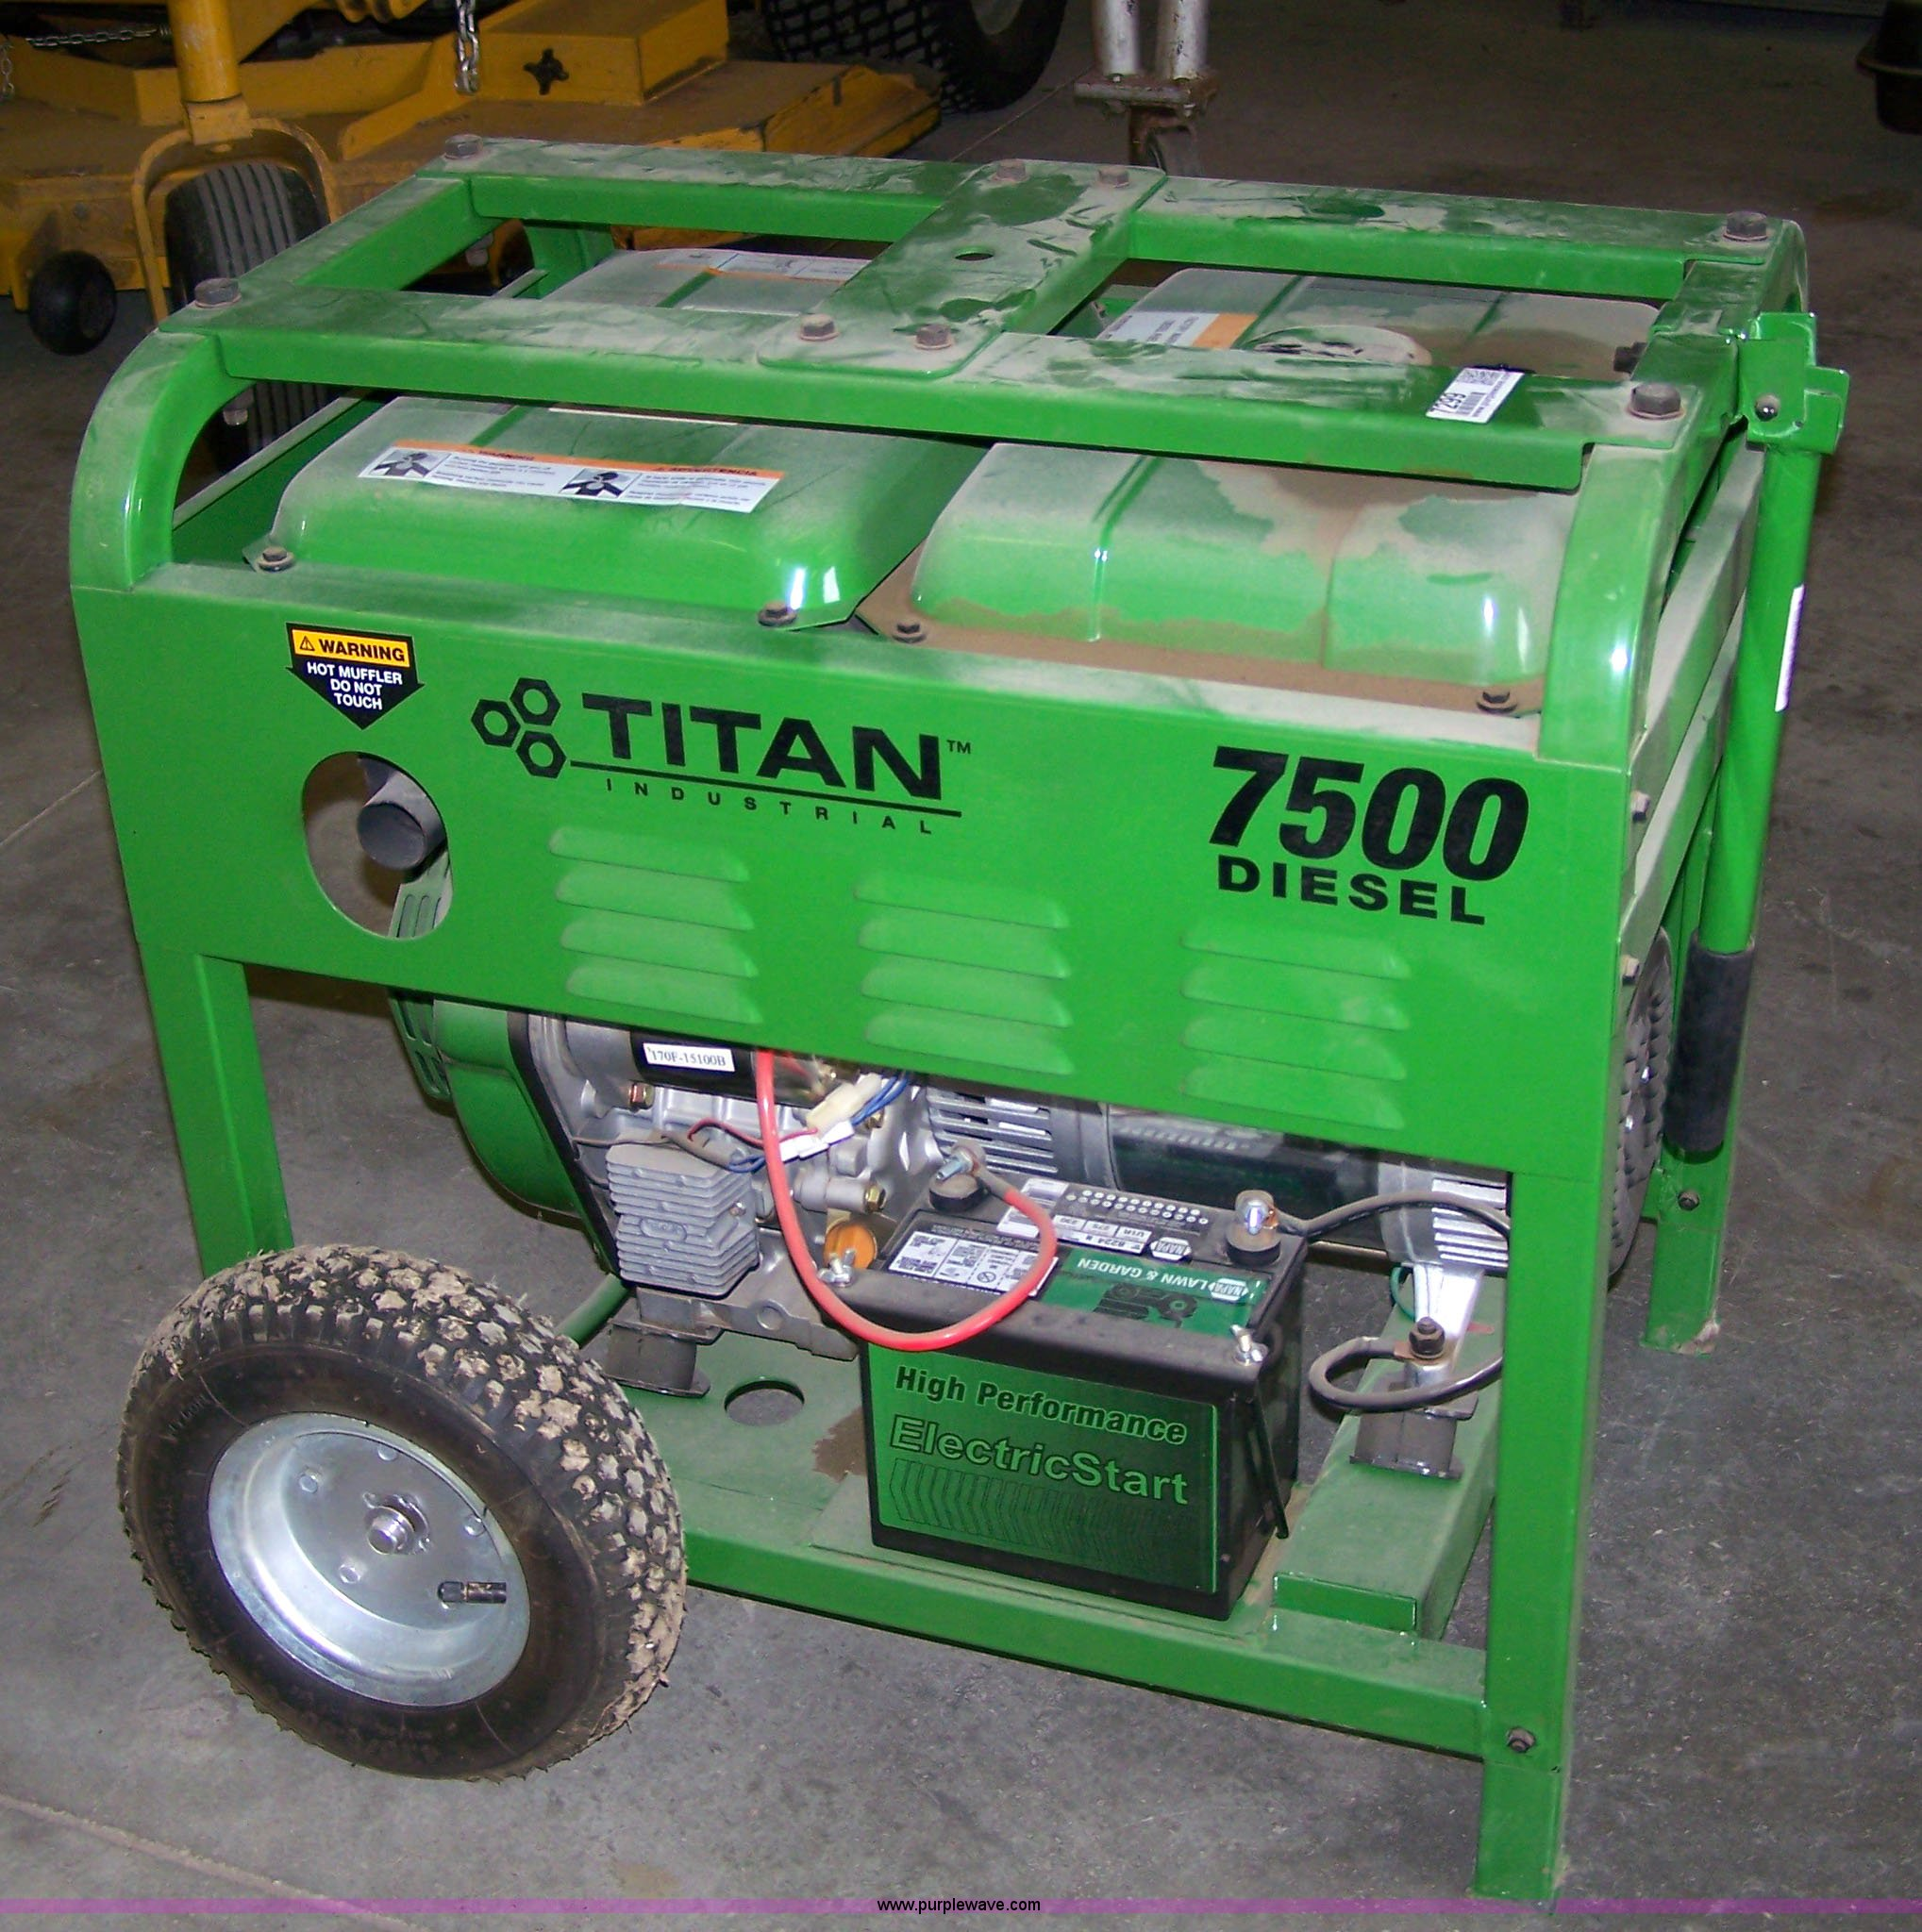 Titan 7500 Diesel Generator Item 7299 11 30 2010